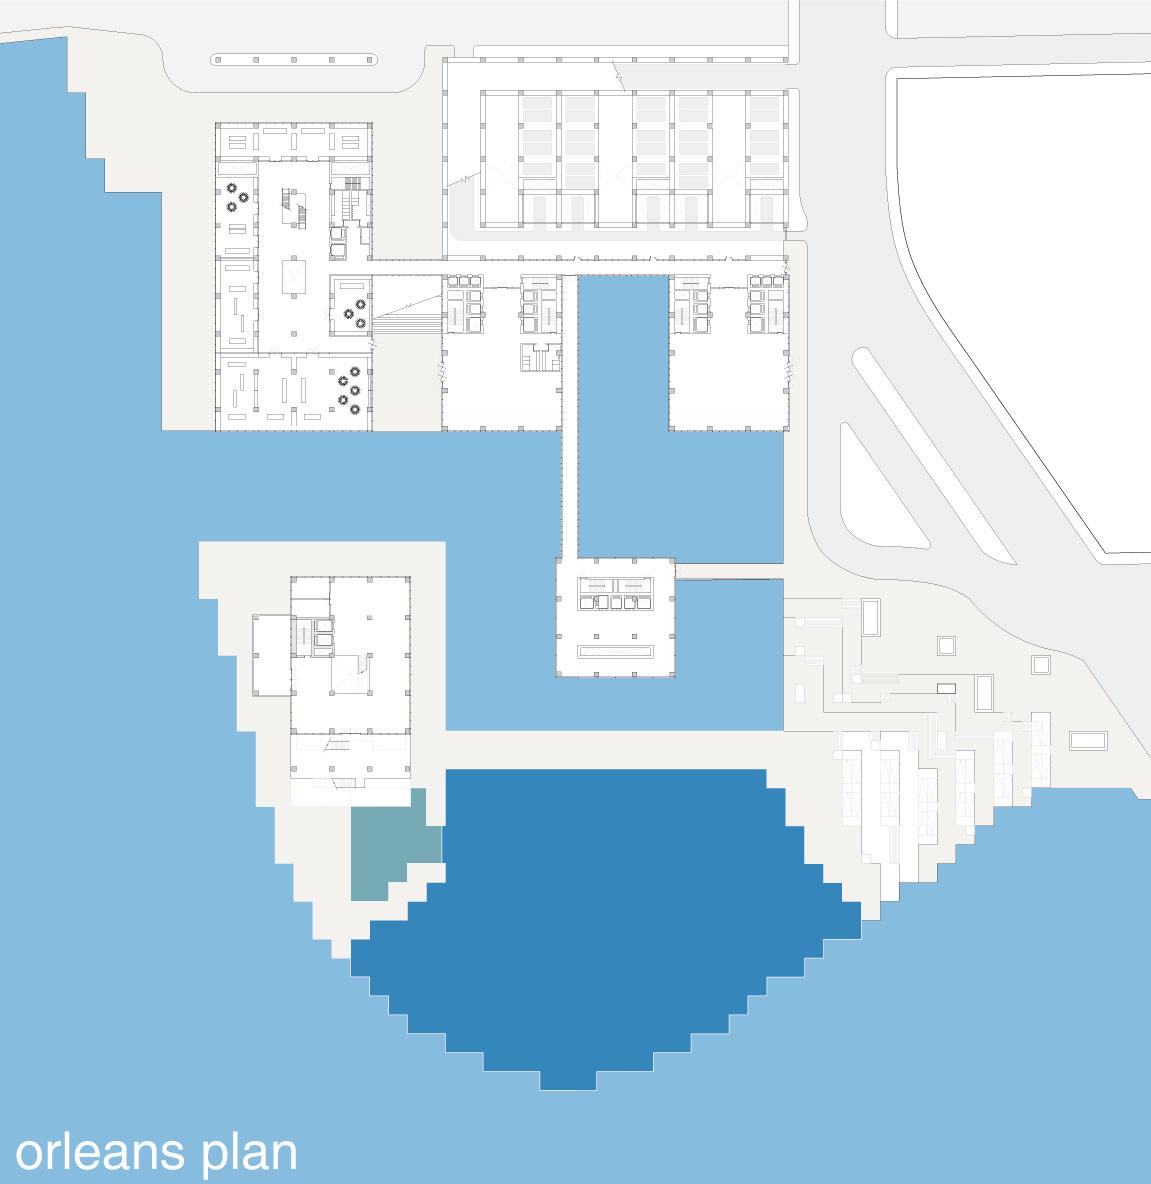 orleans-plan.jpg